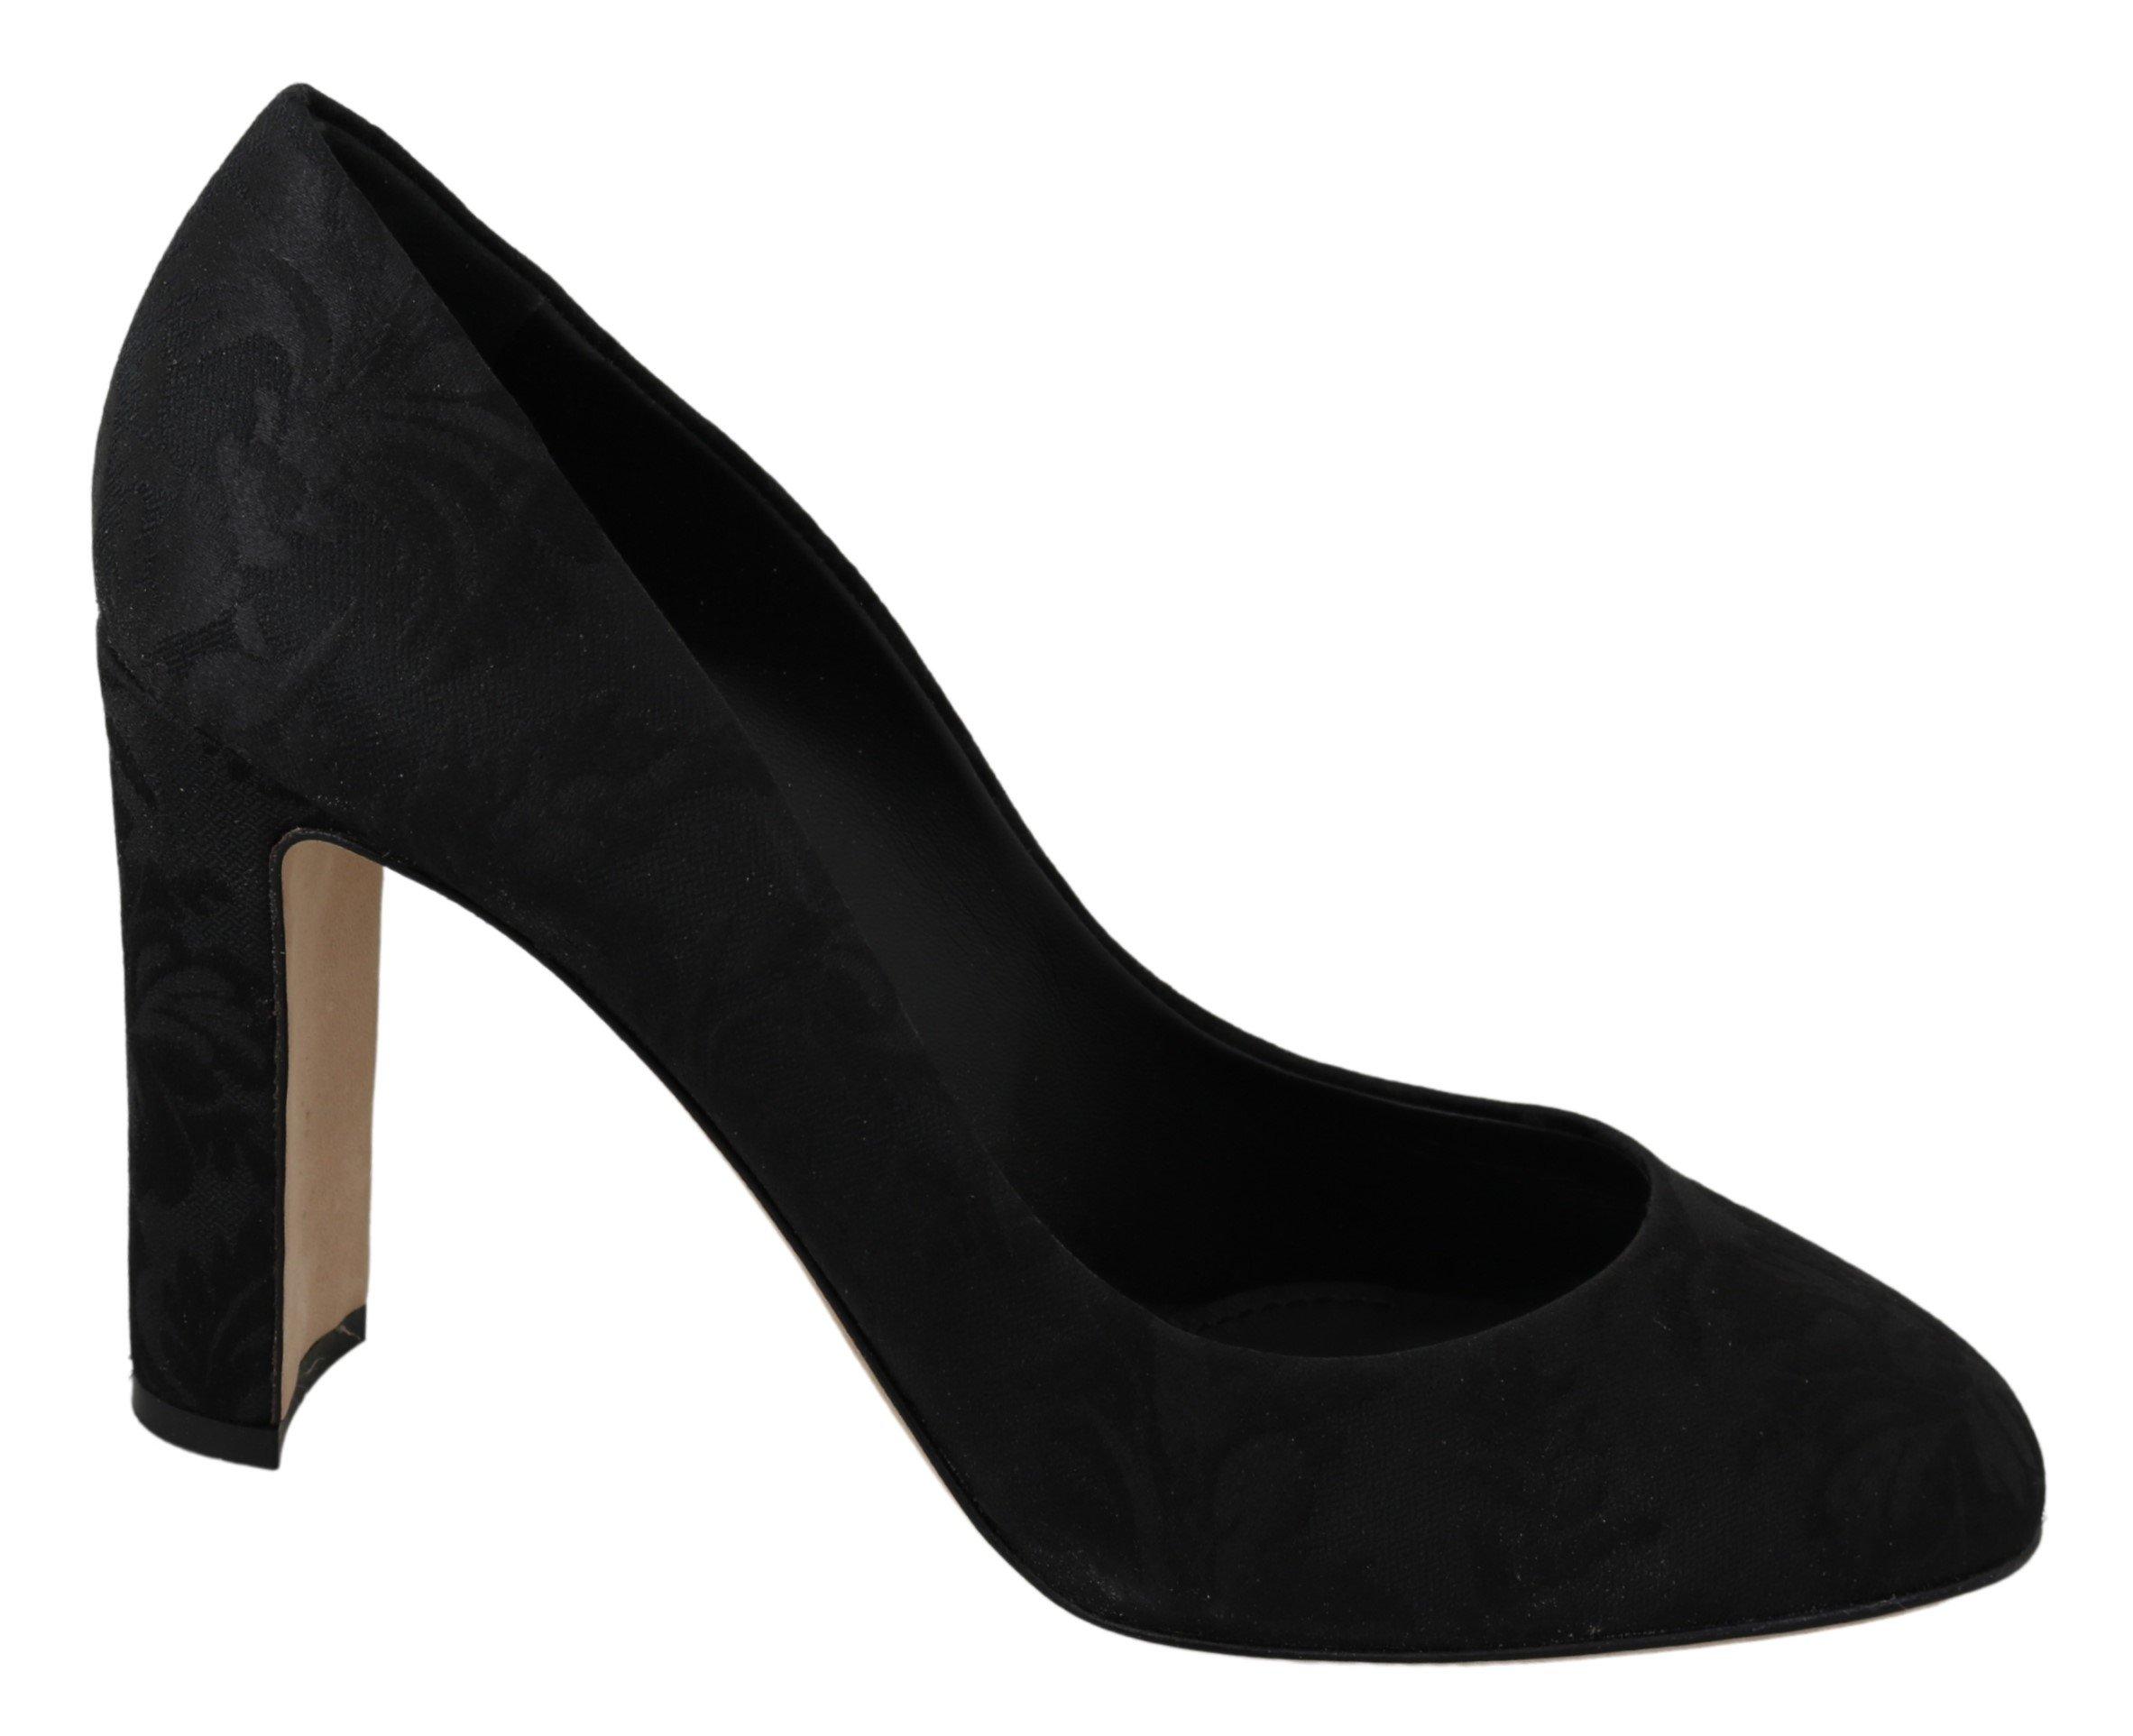 Dolce & Gabbana Women's Jacquard Block Pumps Black LA6930 - EU41/US10.5